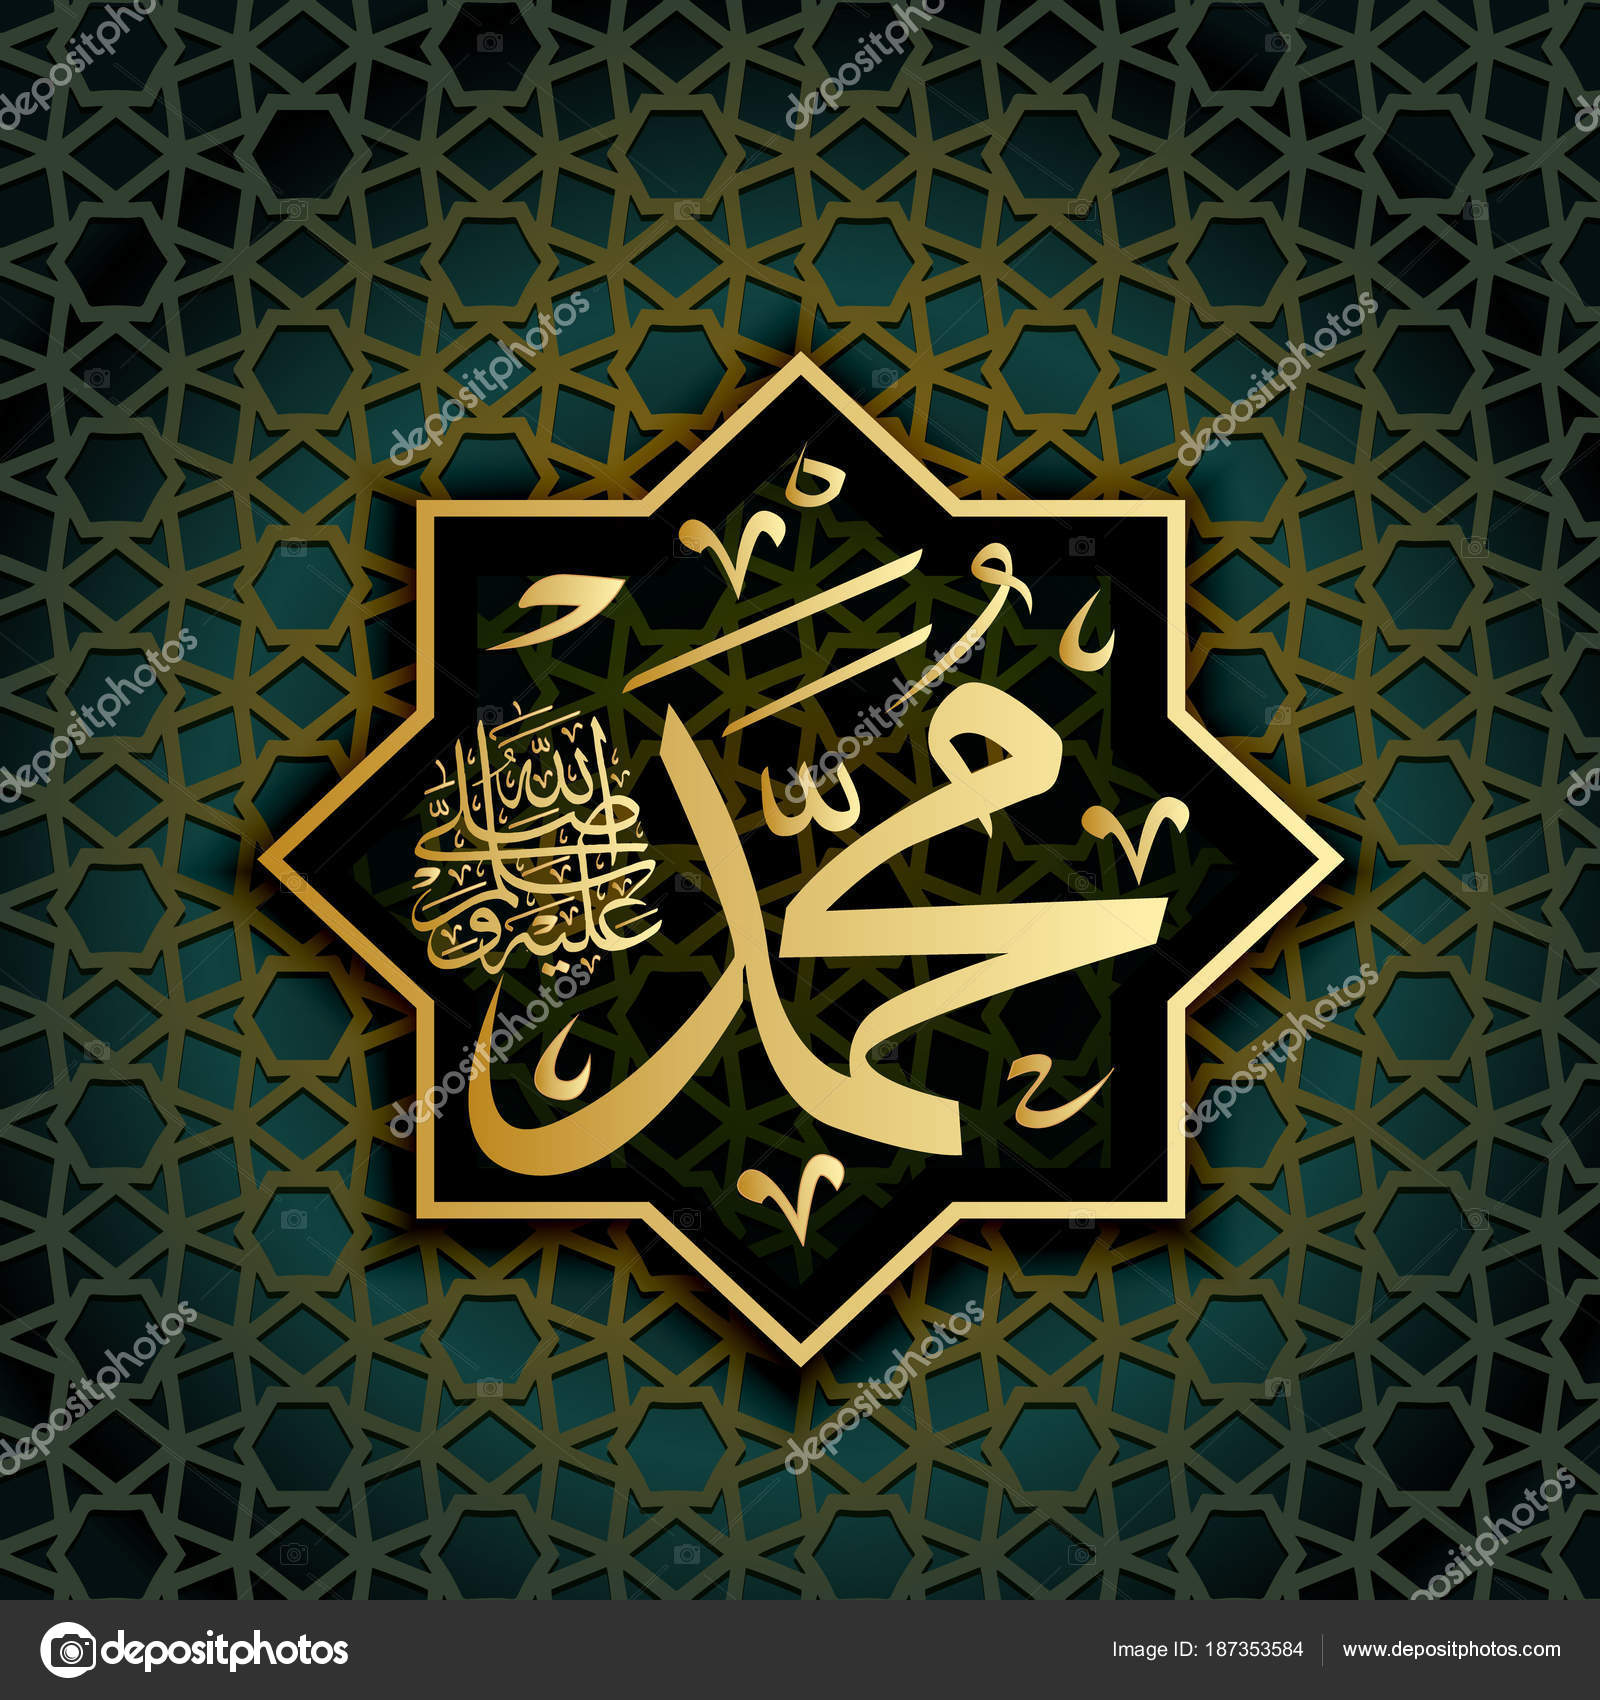 islamic calligraphy muhammad sallallaahu alaihi wa sallam can be